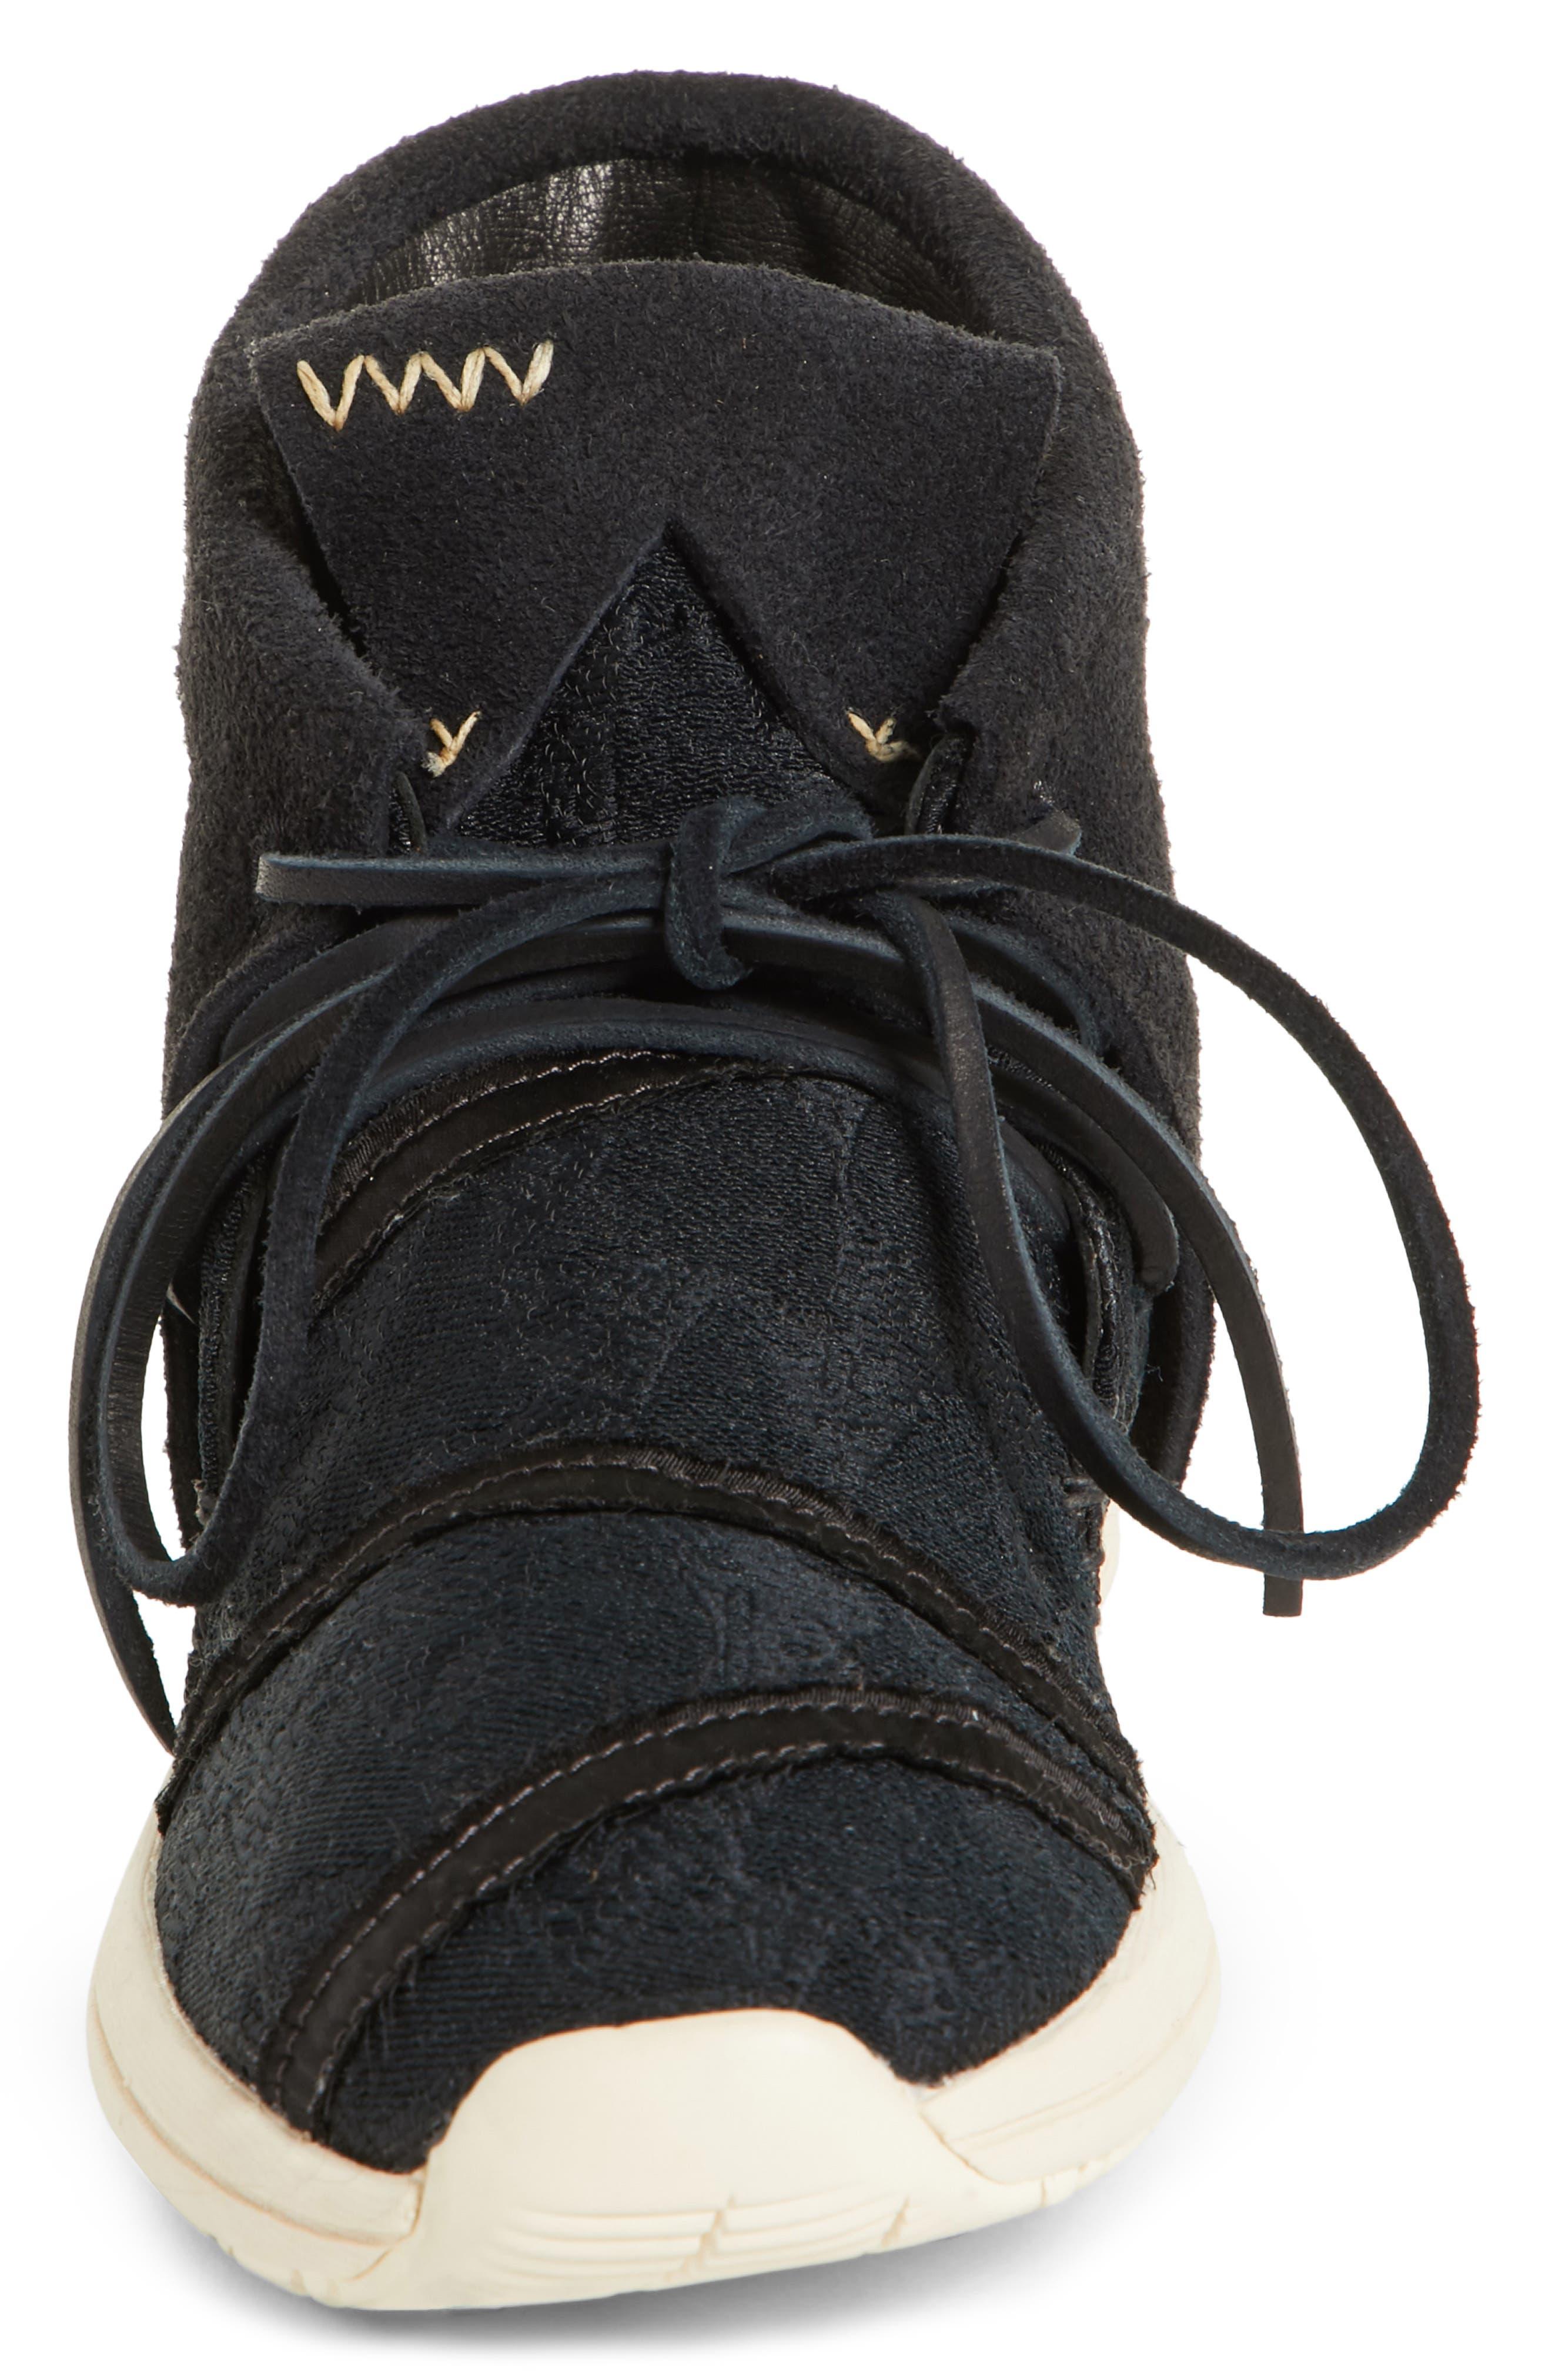 Huron Lhamo Hi Folk Hidden Wedge Sneaker,                             Alternate thumbnail 4, color,                             004